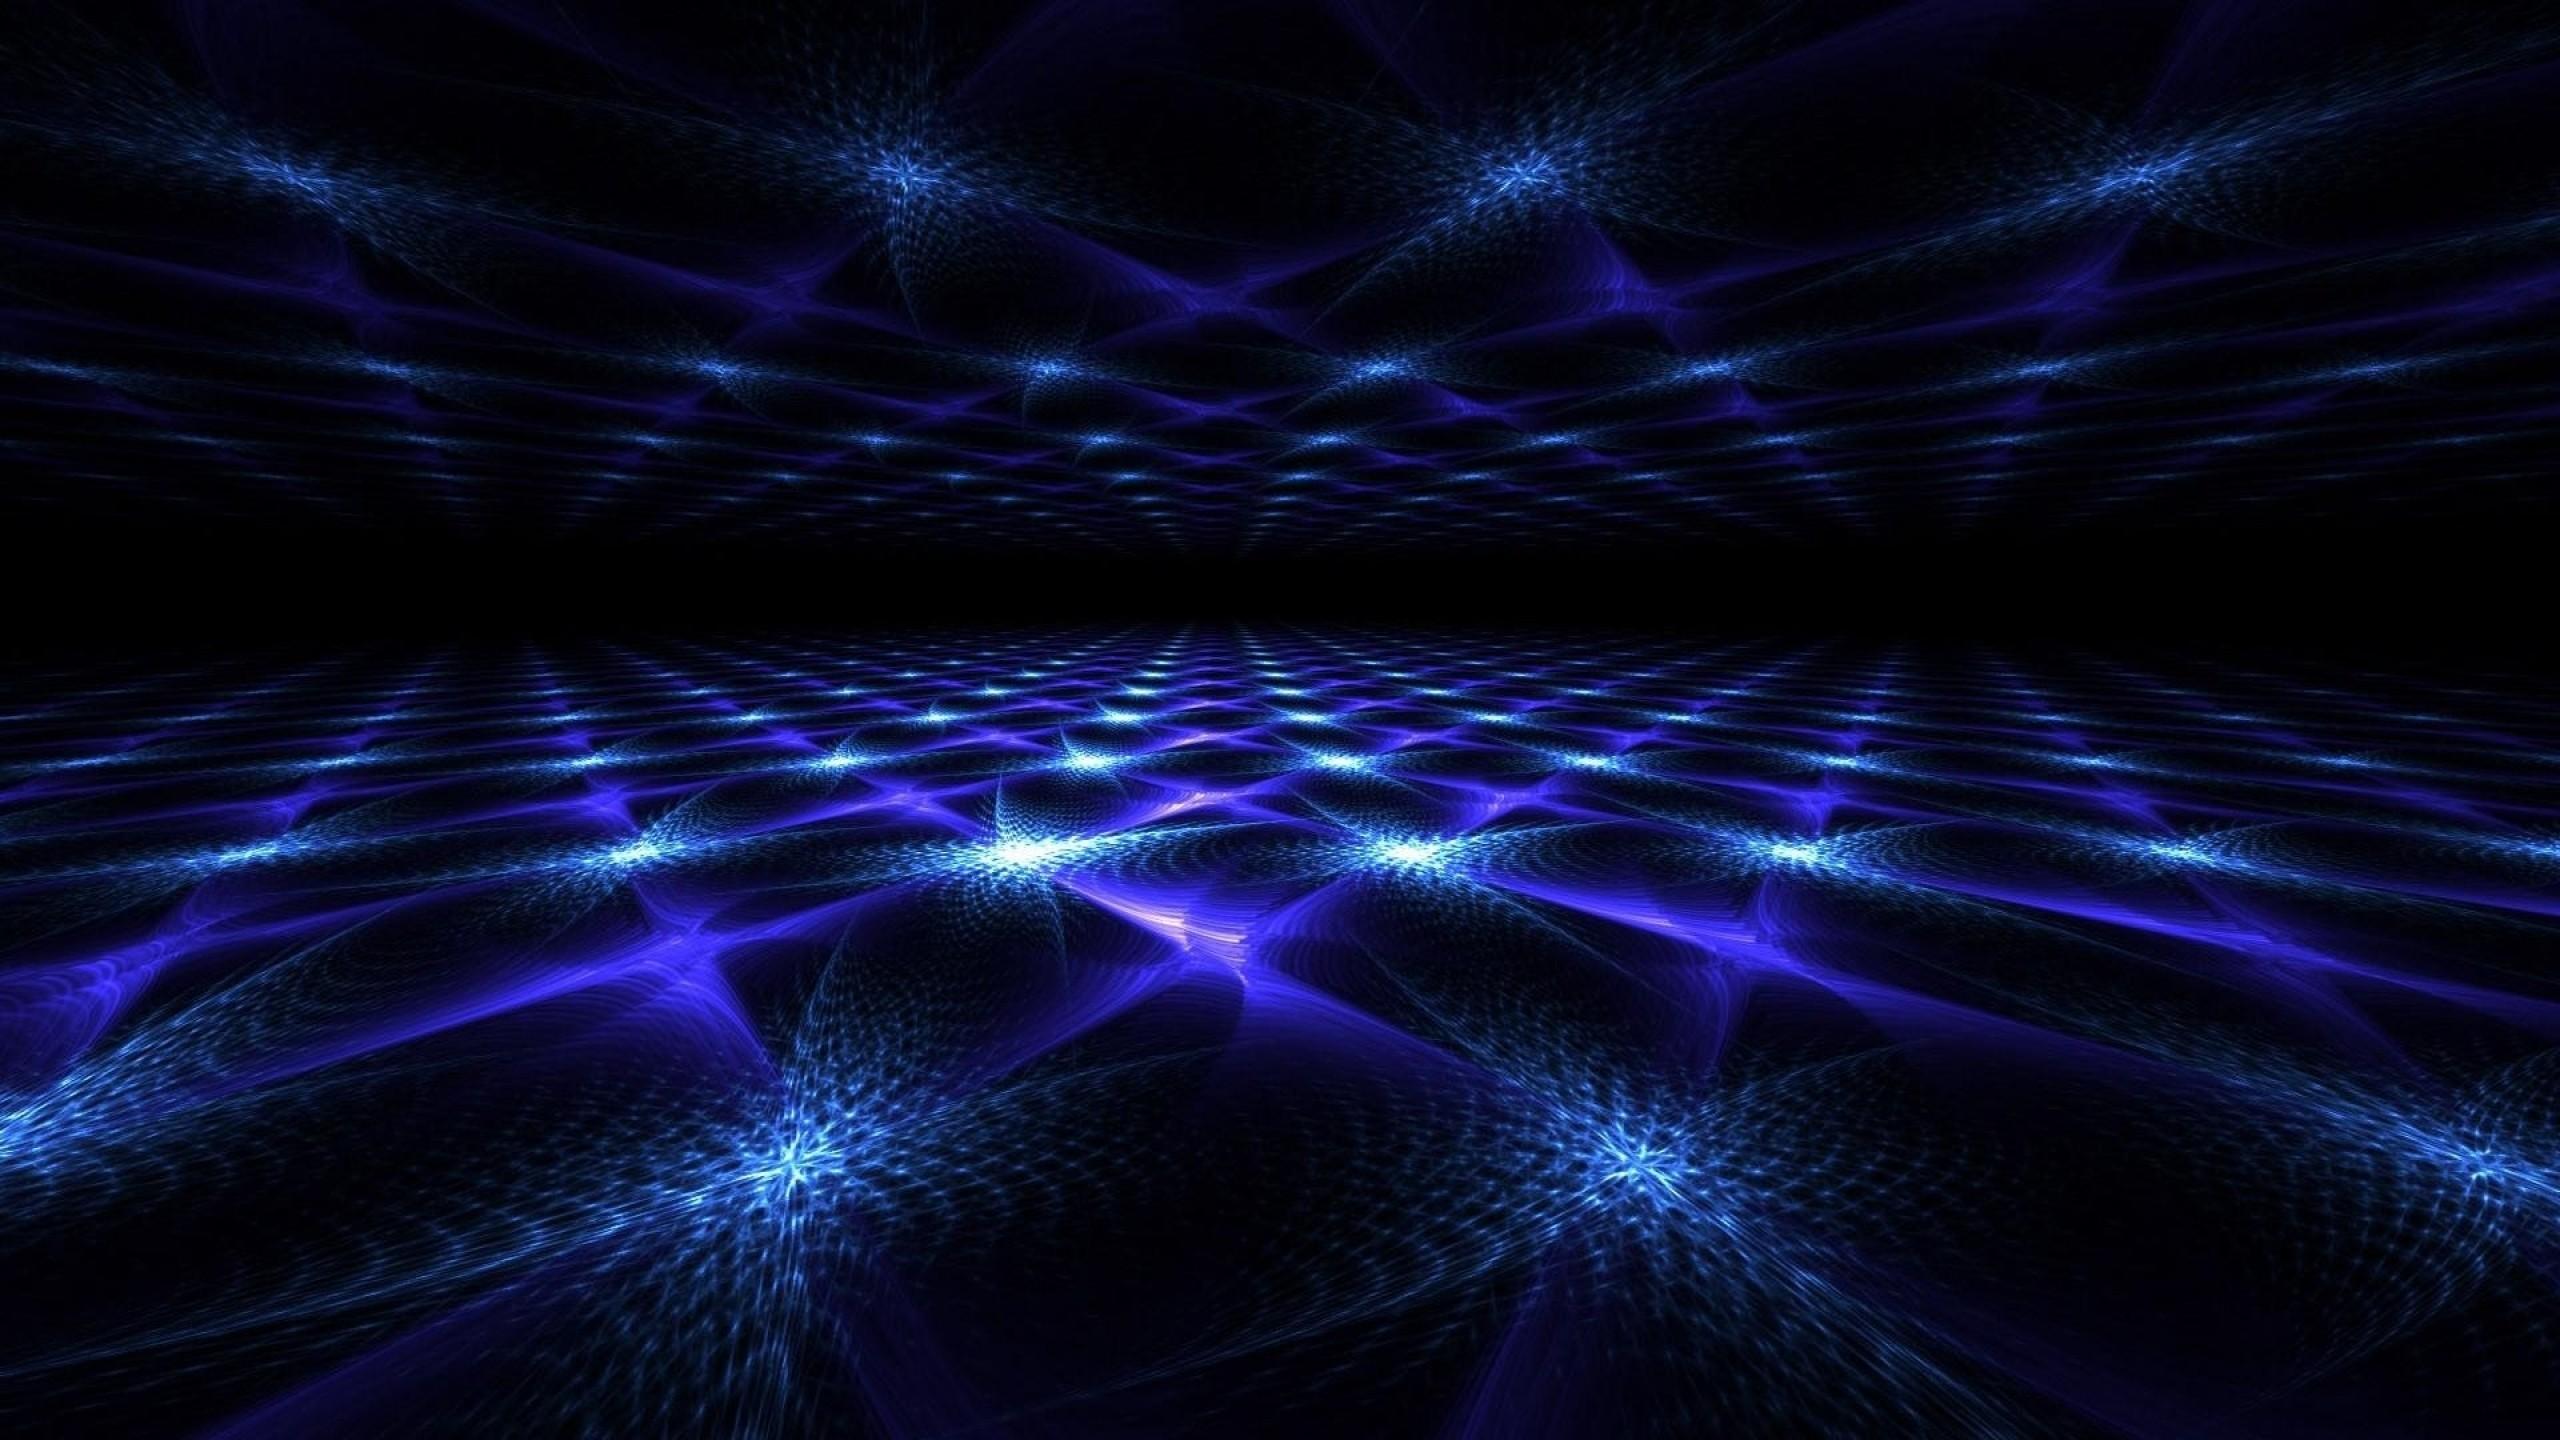 Wallpaper light, abstract, dark, space